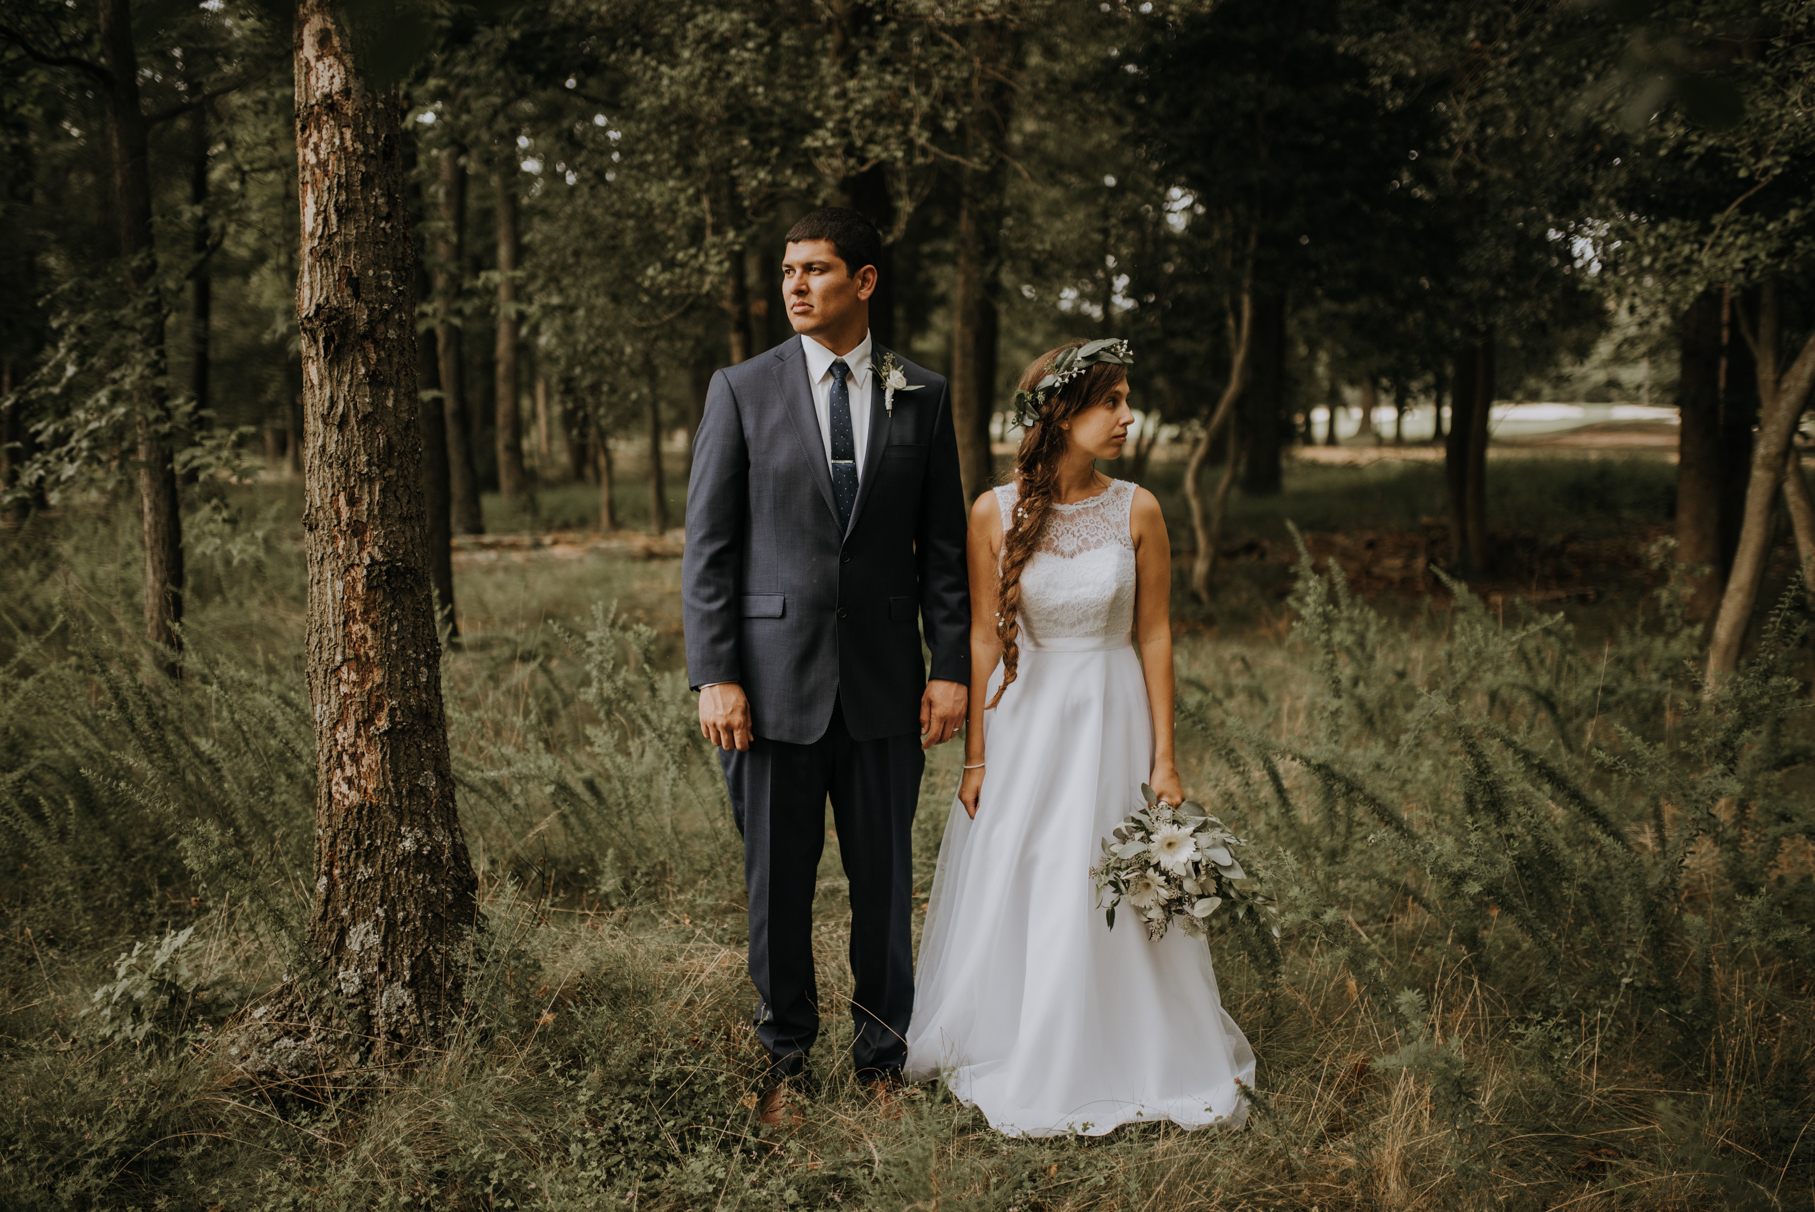 tampa wedding photographer | tampa wedding photography | catie + chris | new york wedding | brooklyn wedding photographer